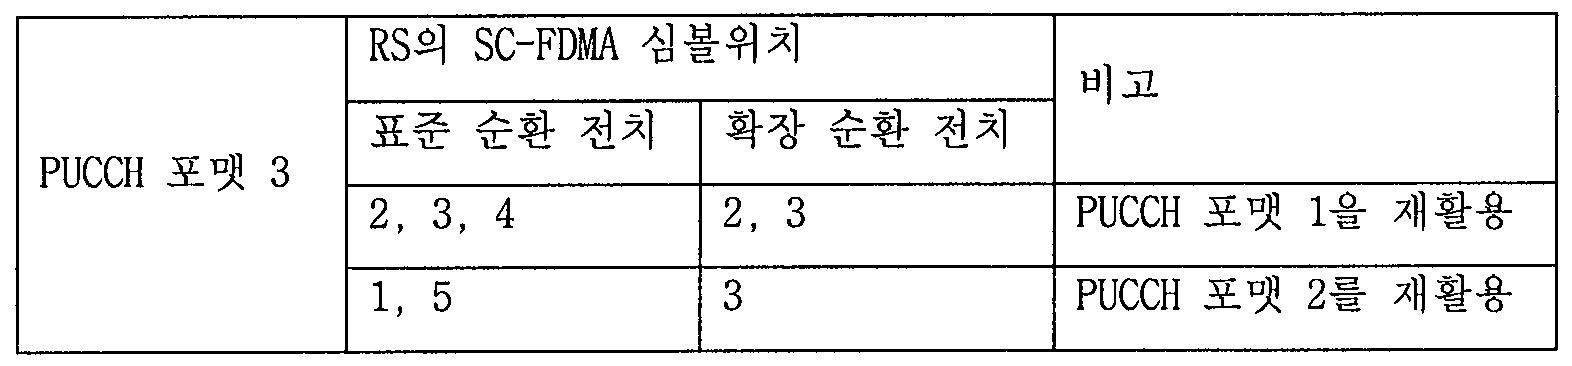 Figure 112011500627815-pat00025